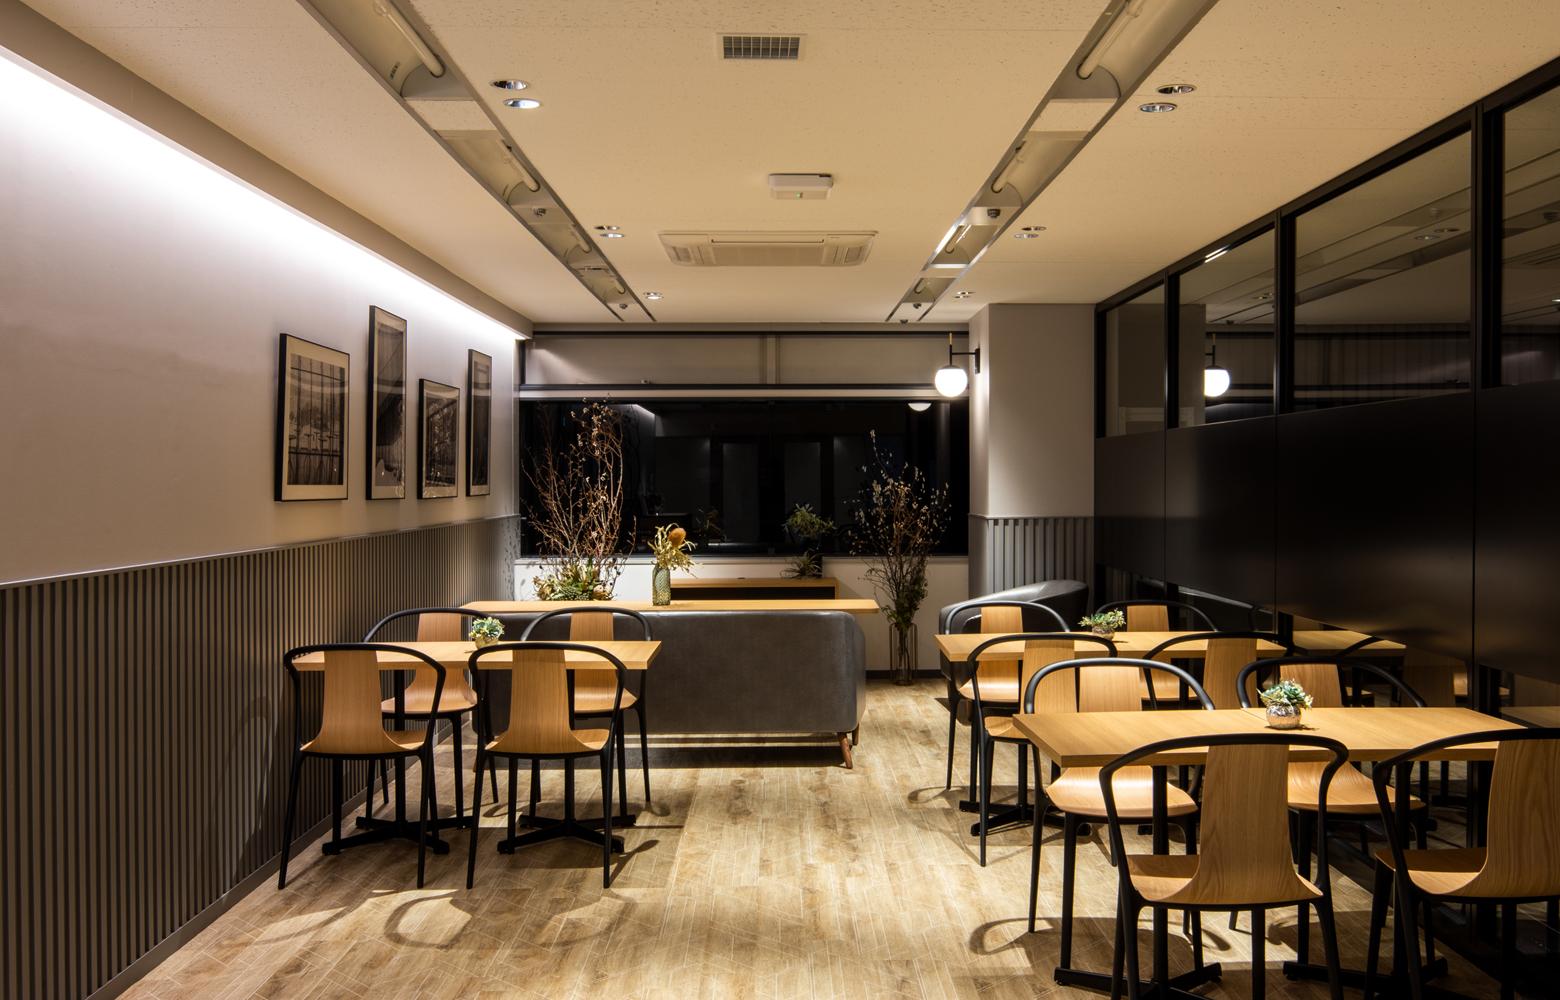 KLab株式会社 Fukuoka Office Refresh Space デザイン・レイアウト事例